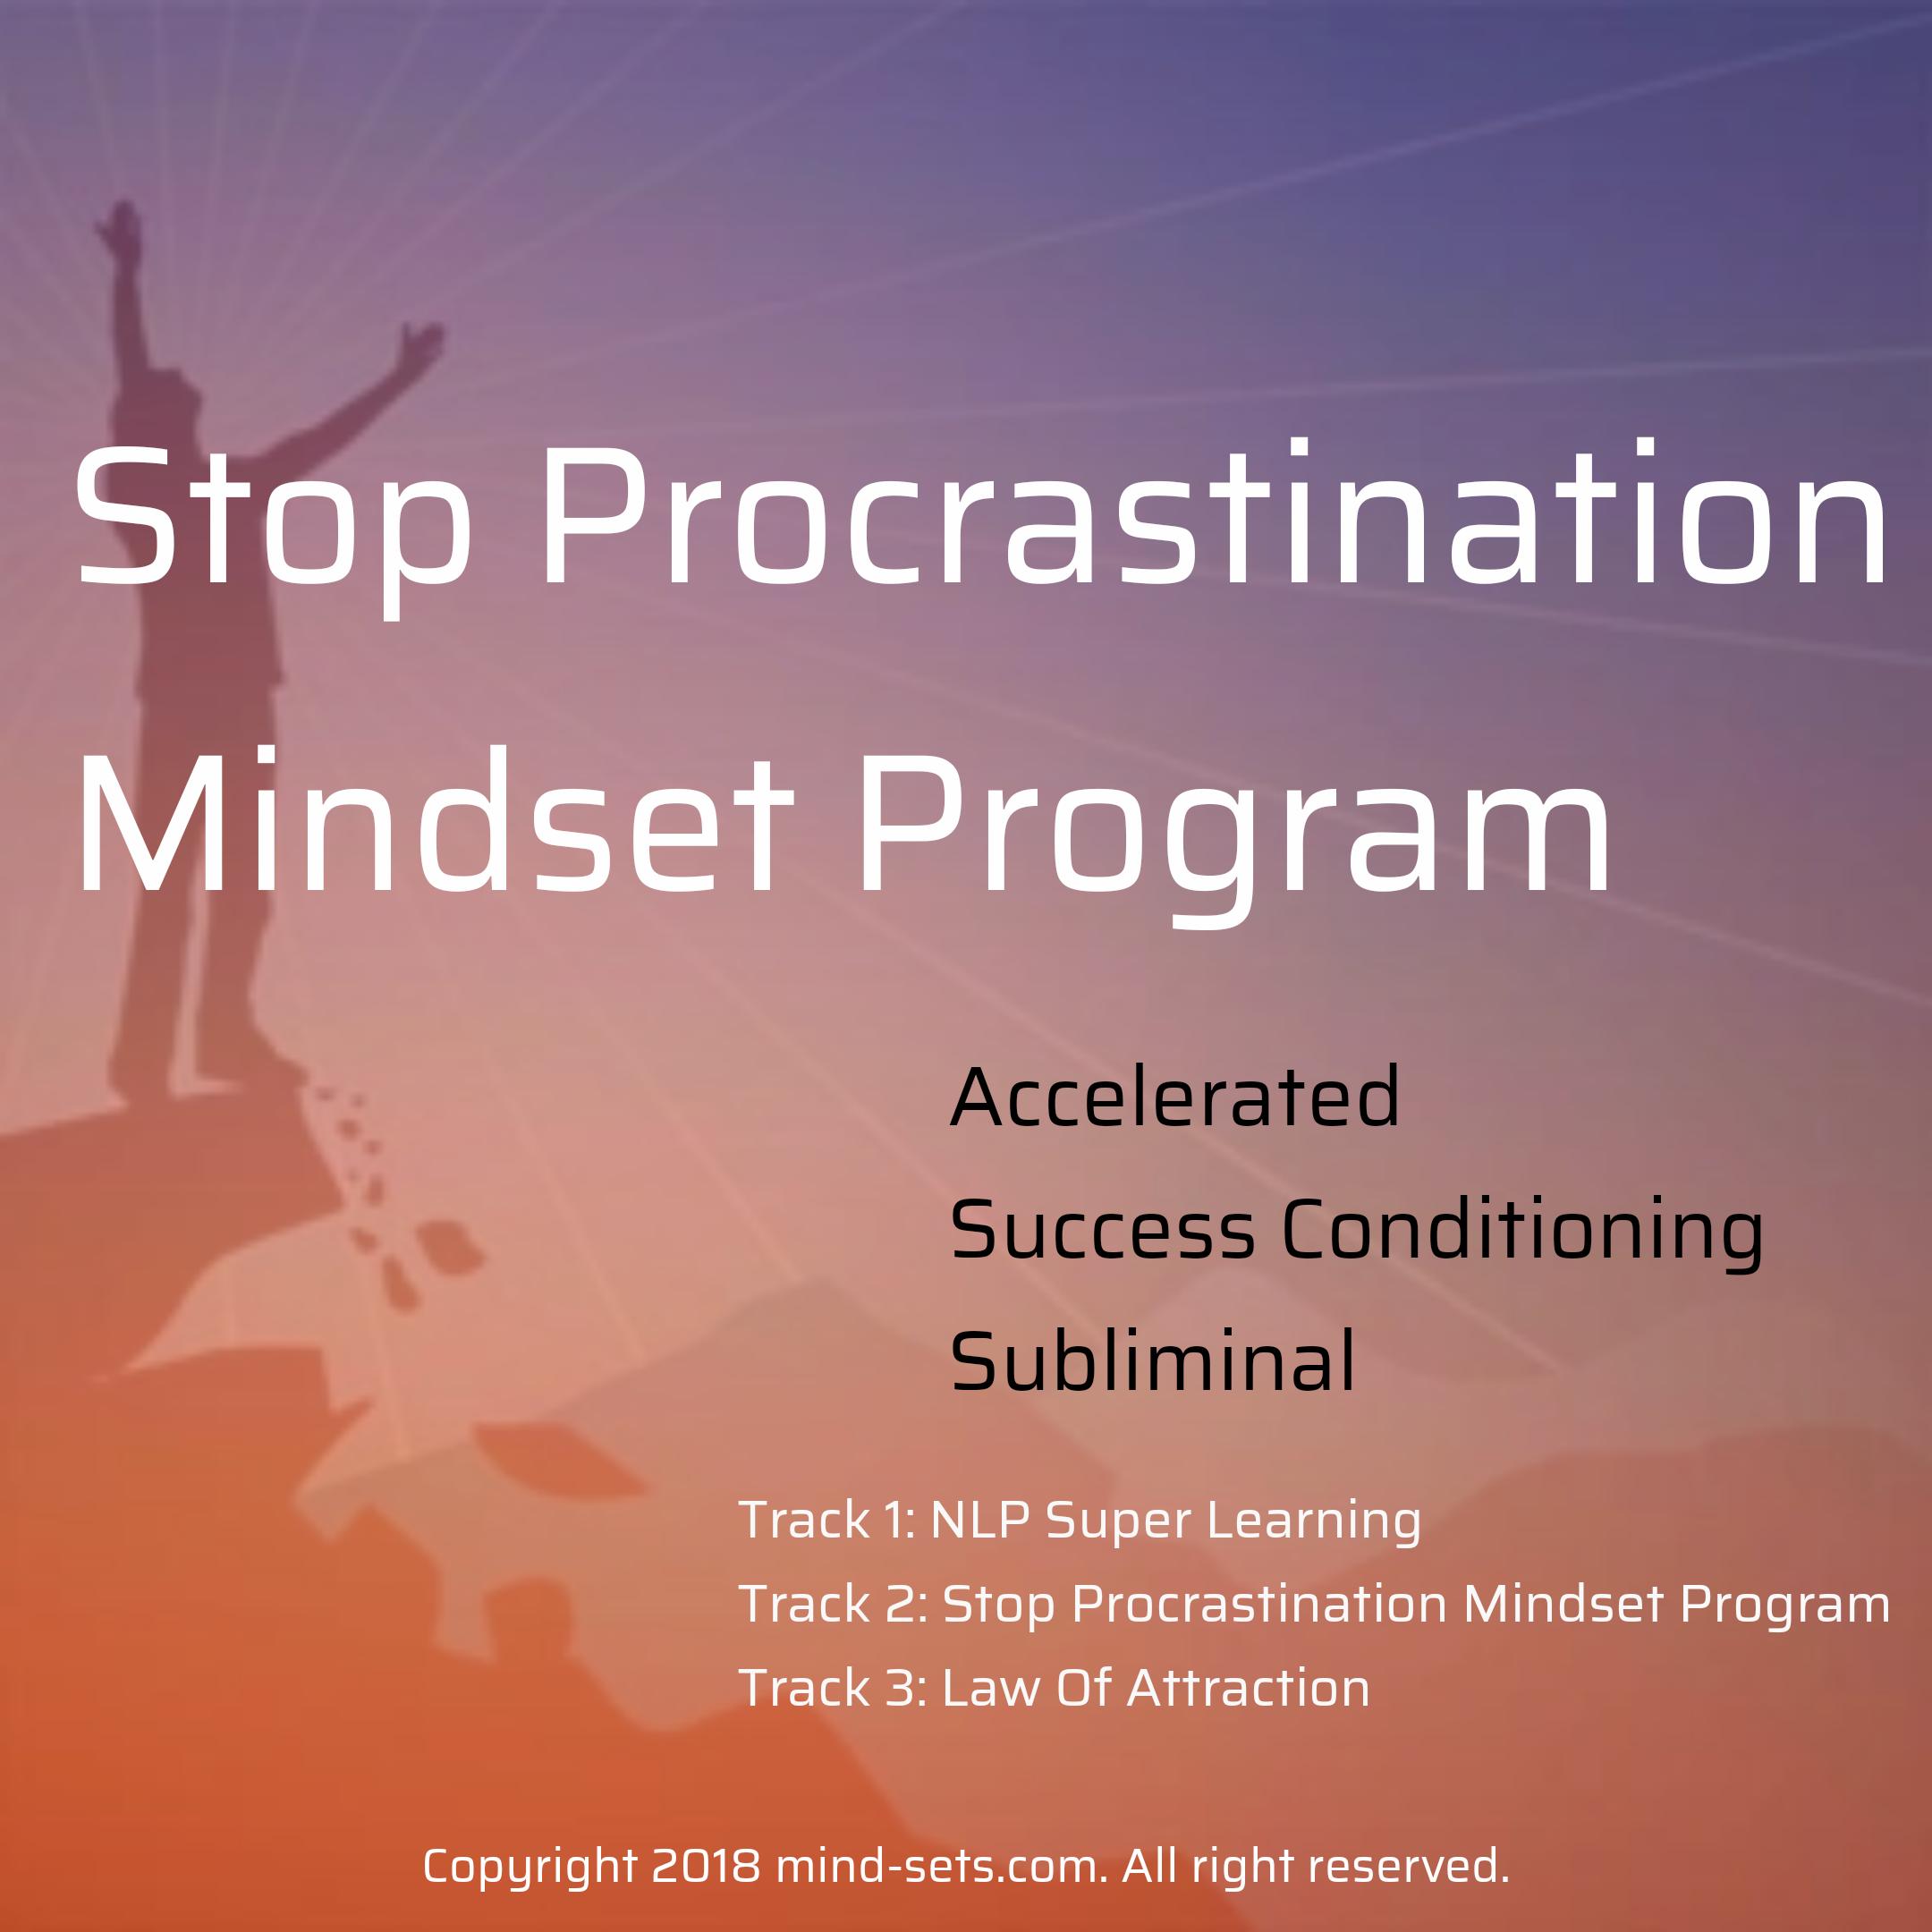 Stop Procrastination Mindset Program